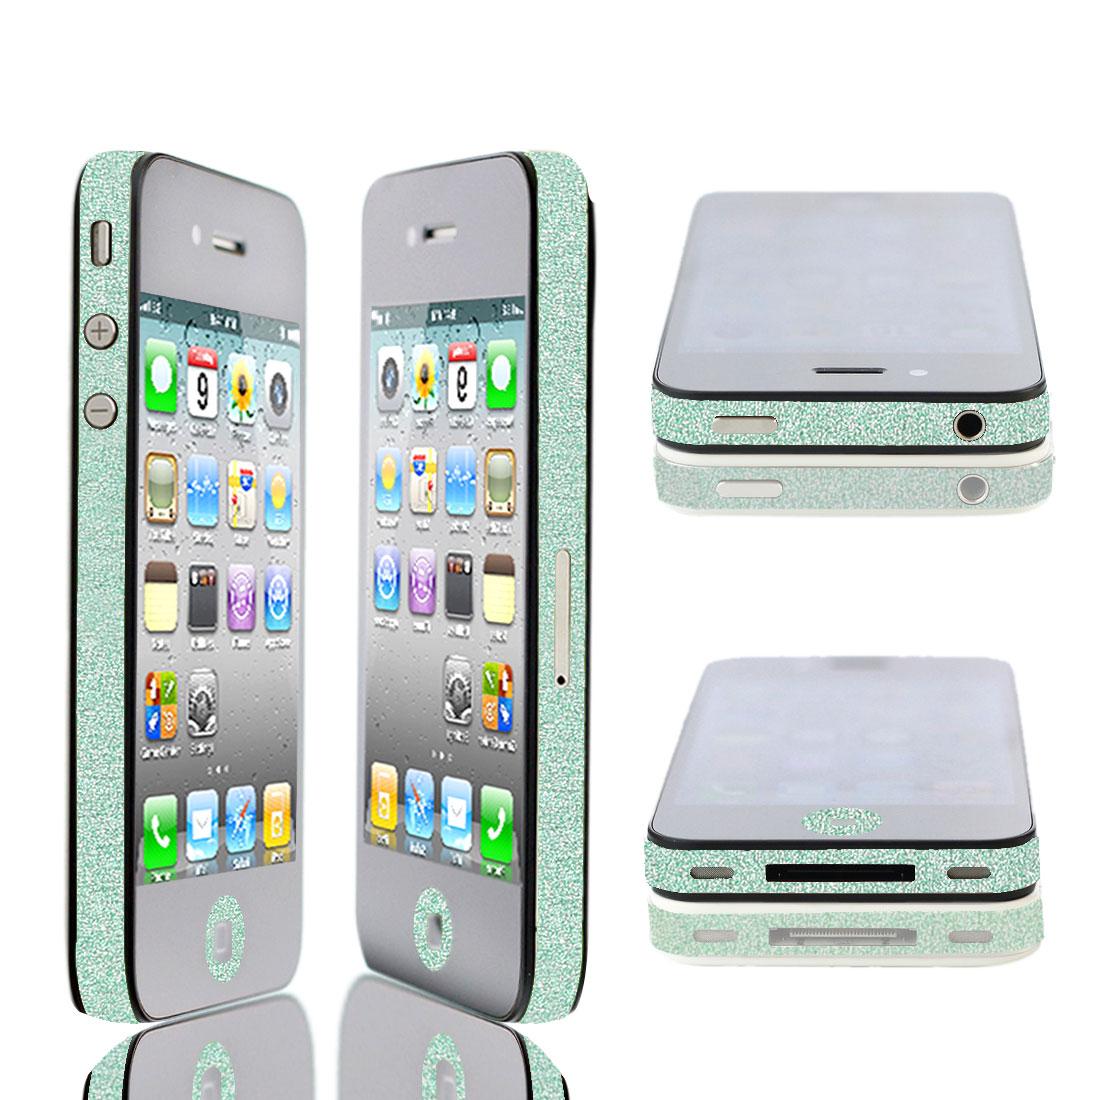 Green Glitter Glittery Bumper Side Edge Skin Decal Sticker for iPhone 5 5G